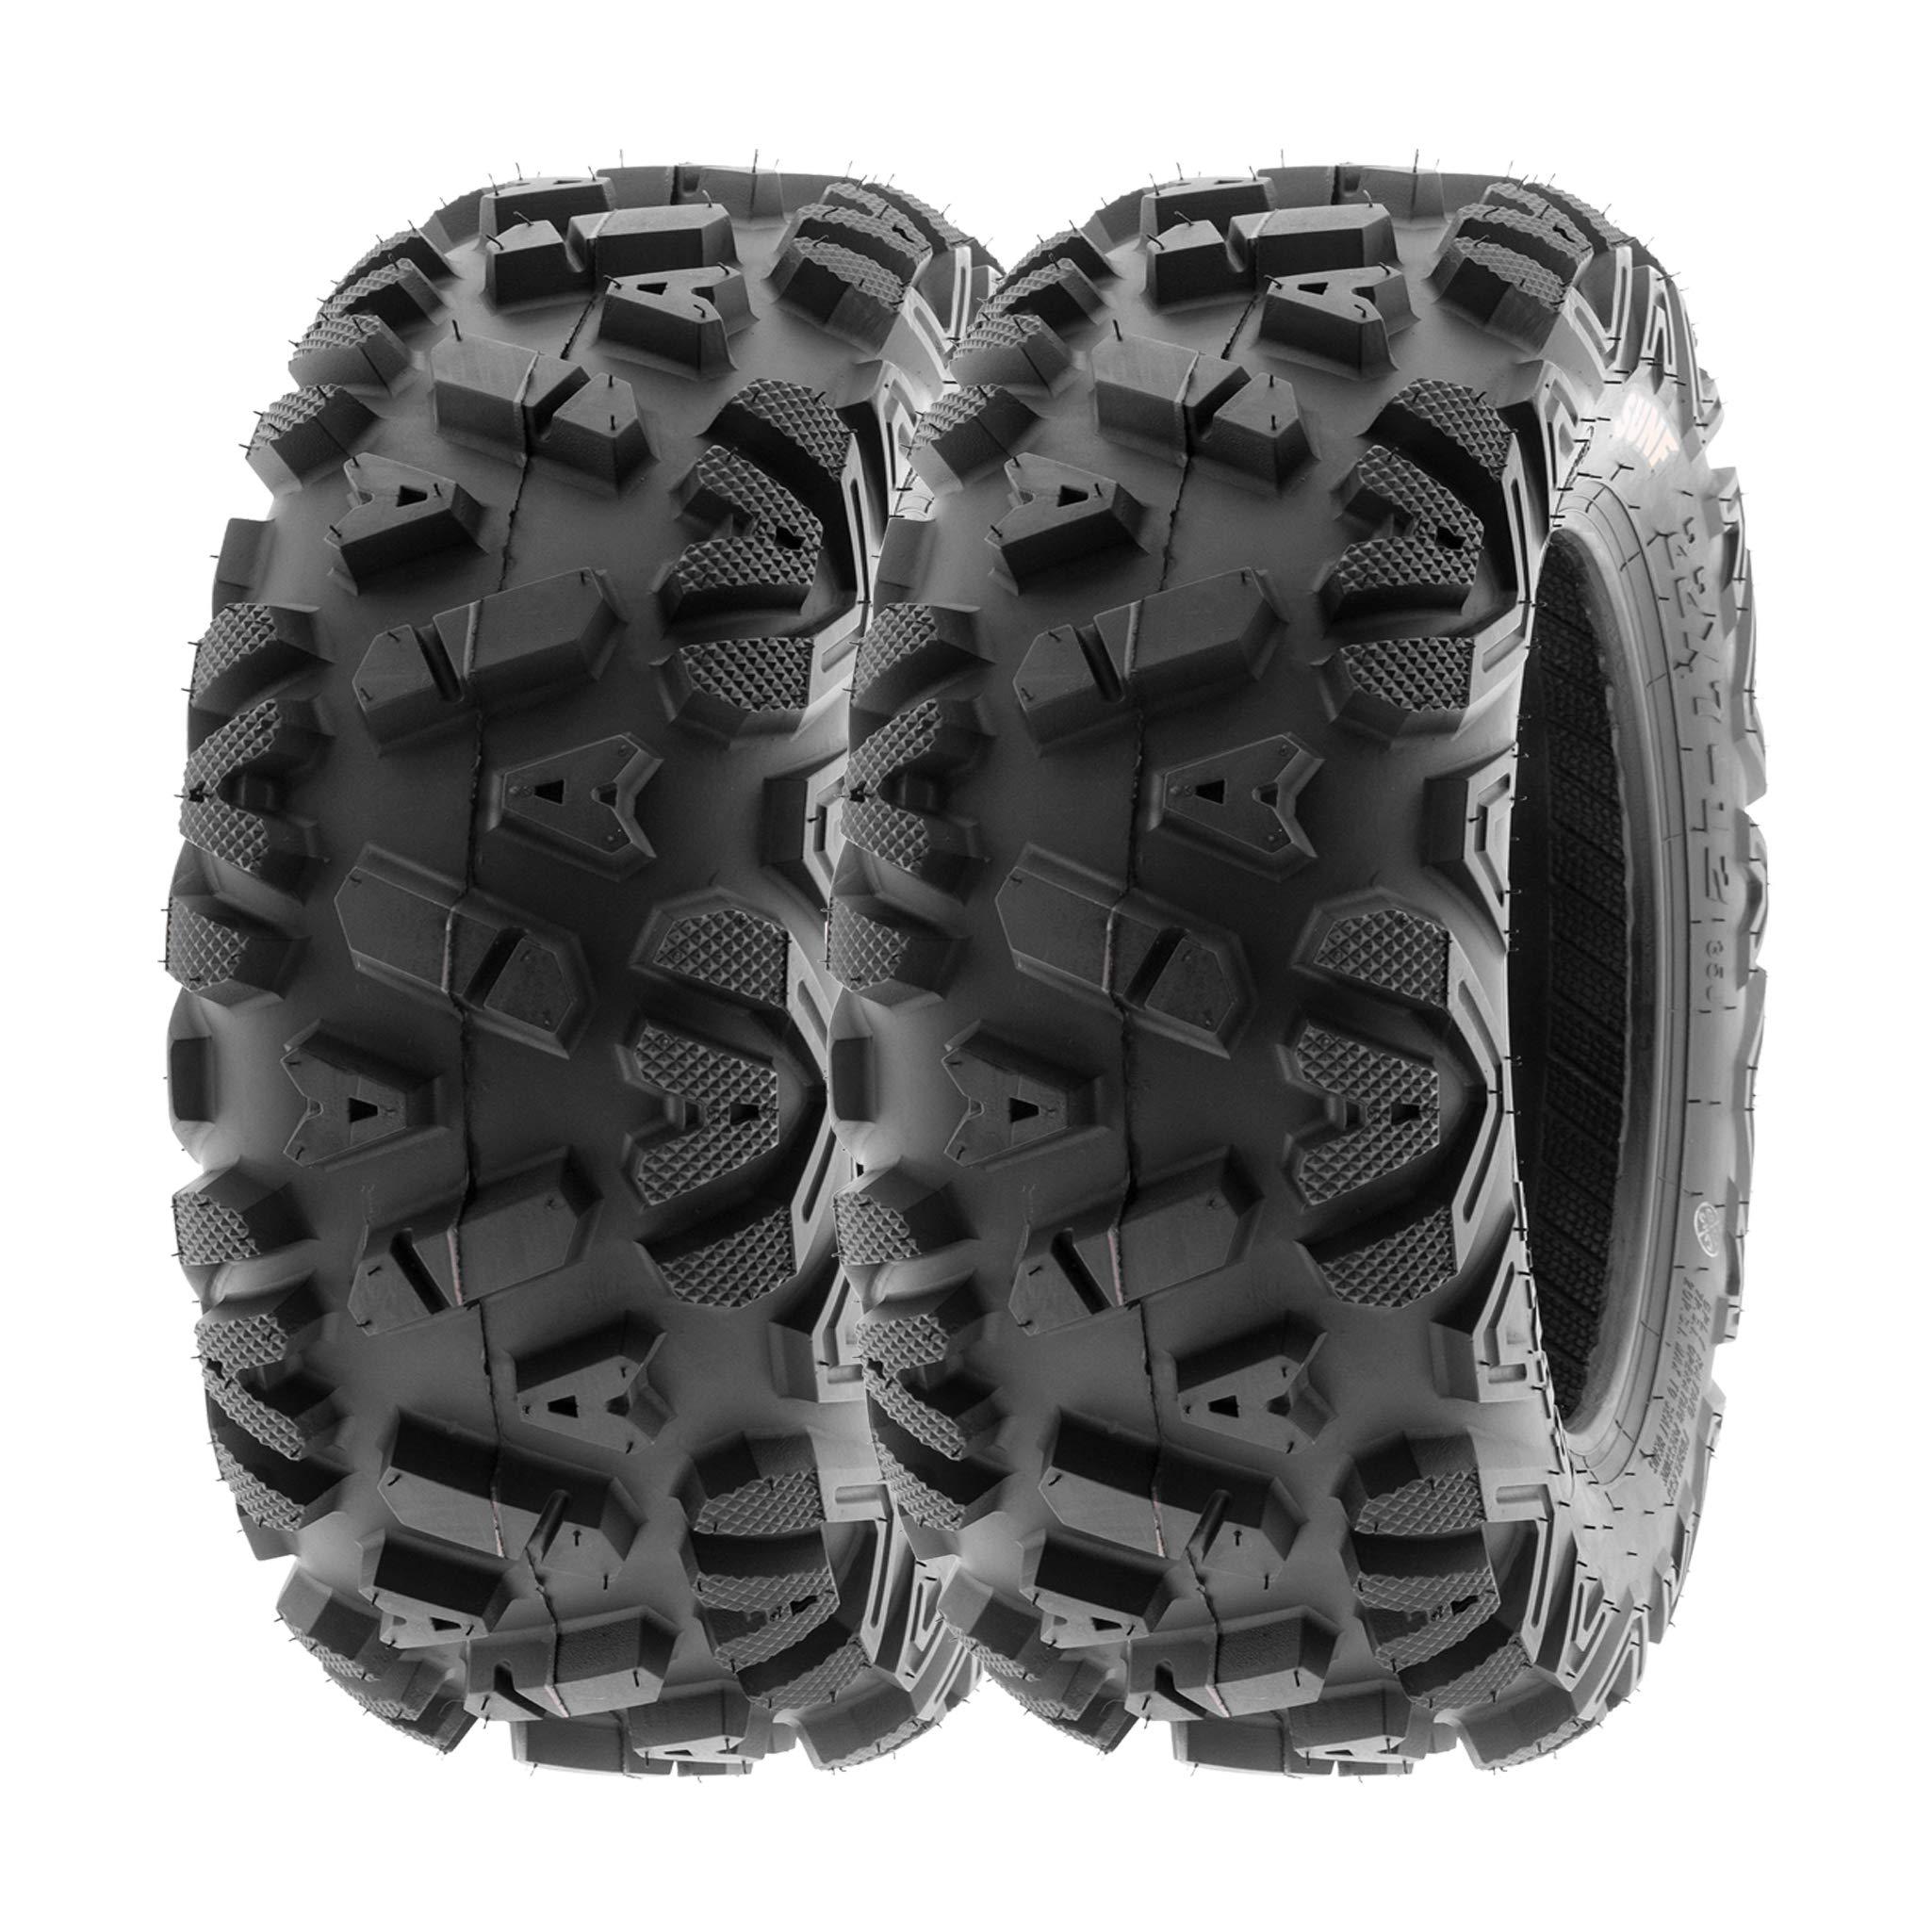 SunF 25x8-11 25x8x11 ATV UTV A/T Replacement Race 6 PR Tubeless Tires A033 POWER I, [Set of 2]